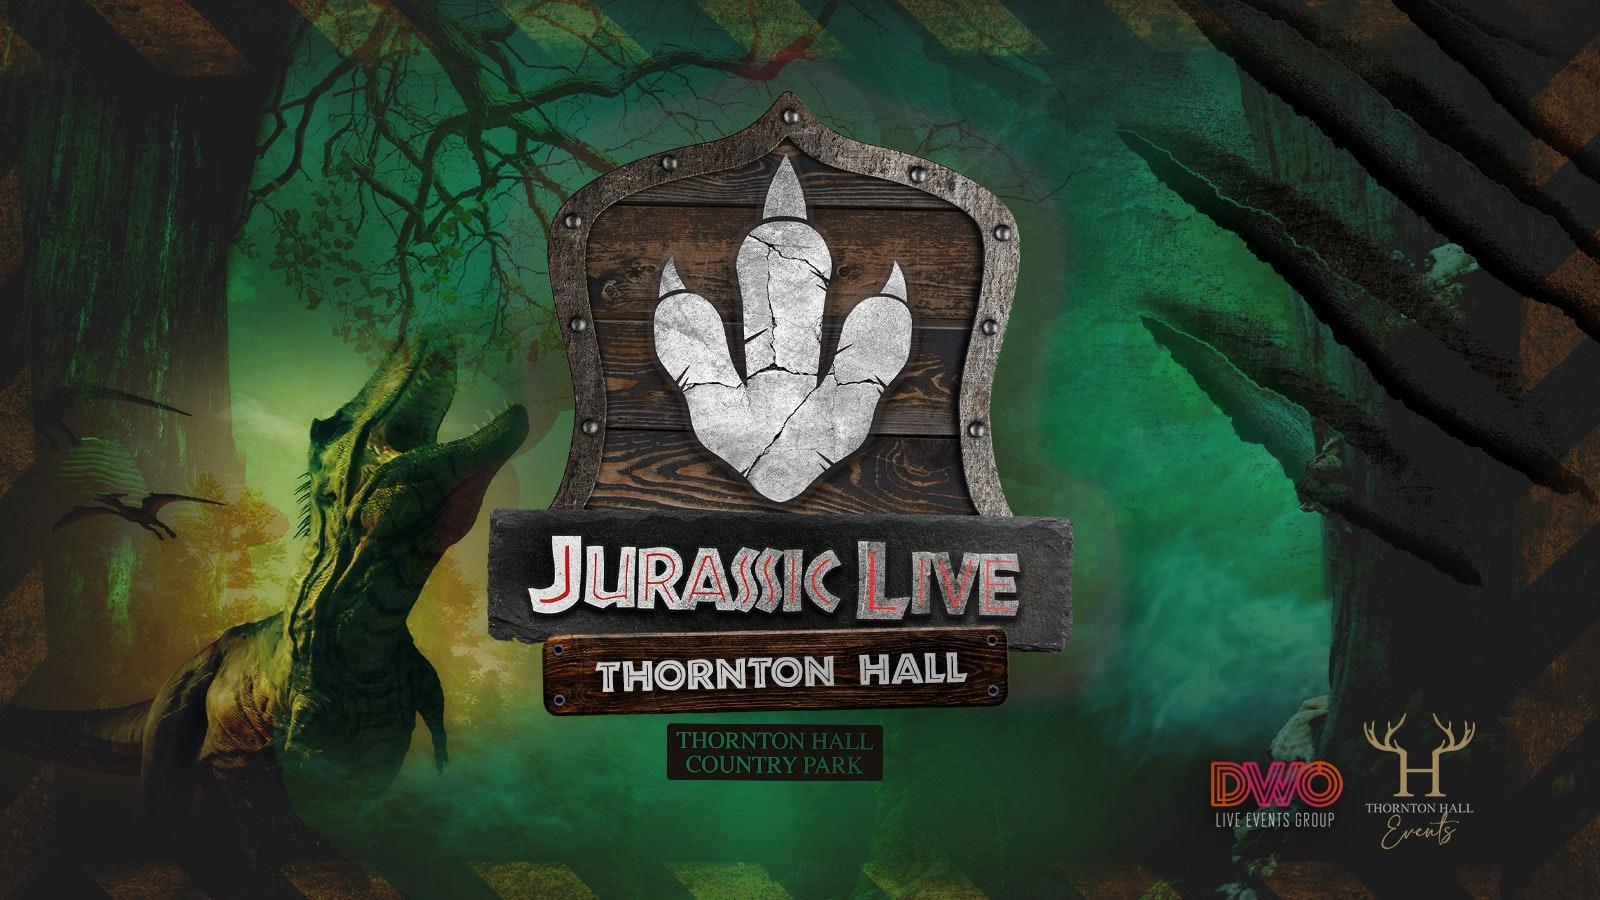 Jurassic Live – Sunday 18th April – 4pm